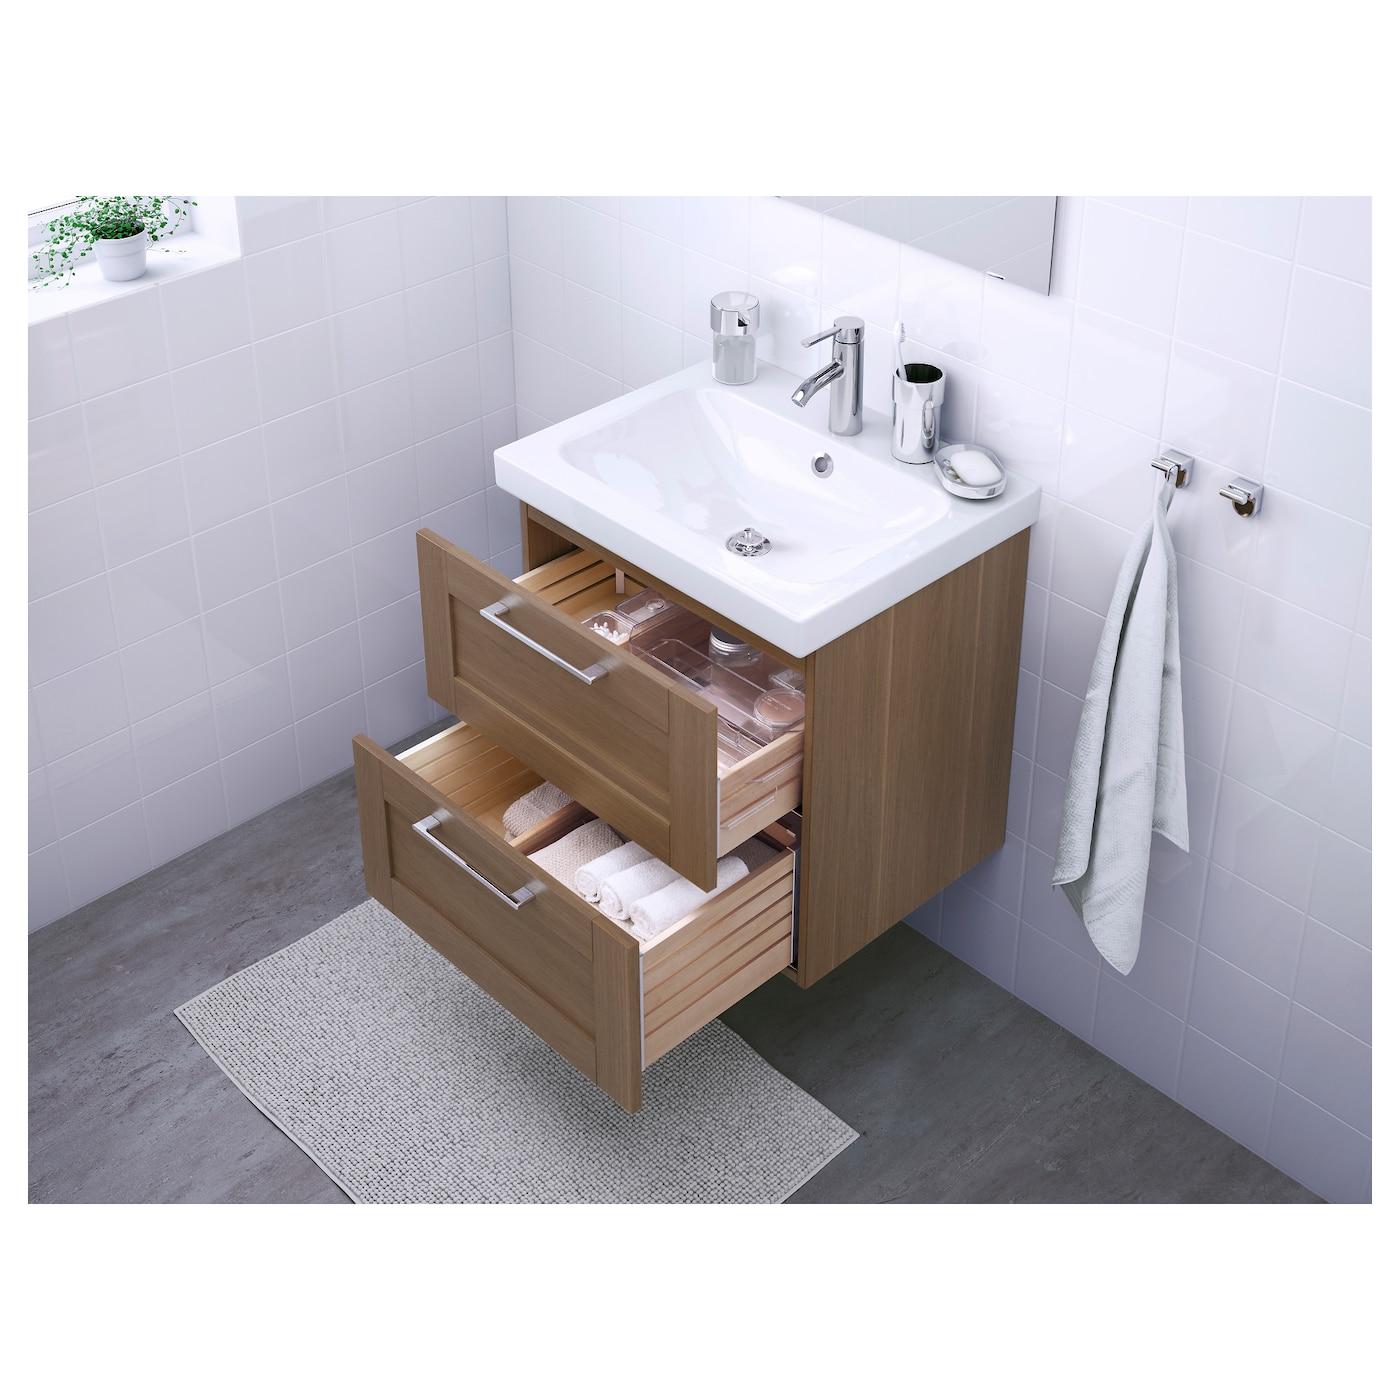 odensvik godmorgon meuble lavabo 2tir motif noyer 63 x 49 x 64 cm ikea. Black Bedroom Furniture Sets. Home Design Ideas